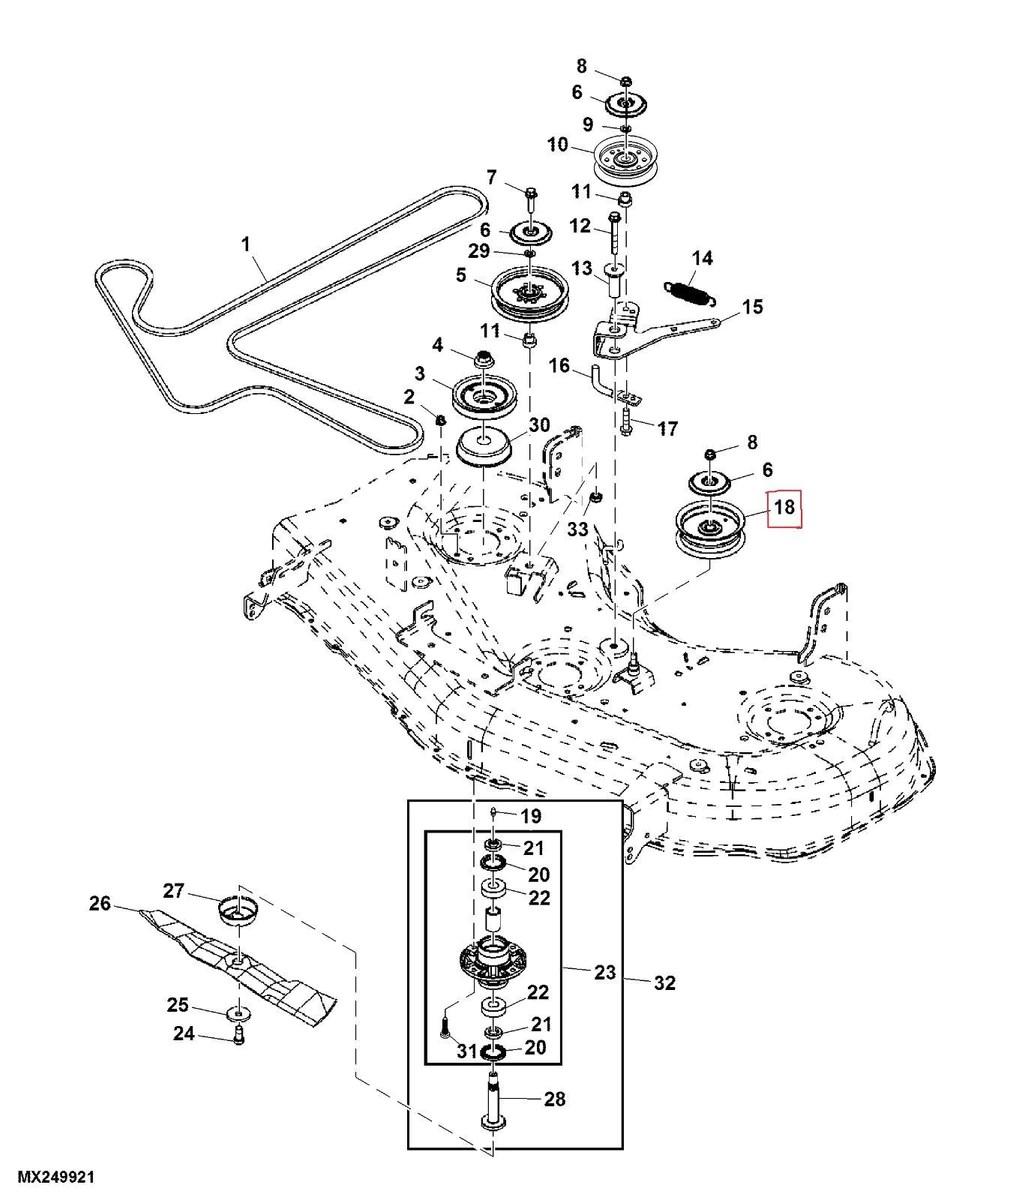 John Deere Zero Turn Mower Deck Idler Pulley  Fits Z425 & Z445  48'' – Mower Parts Source